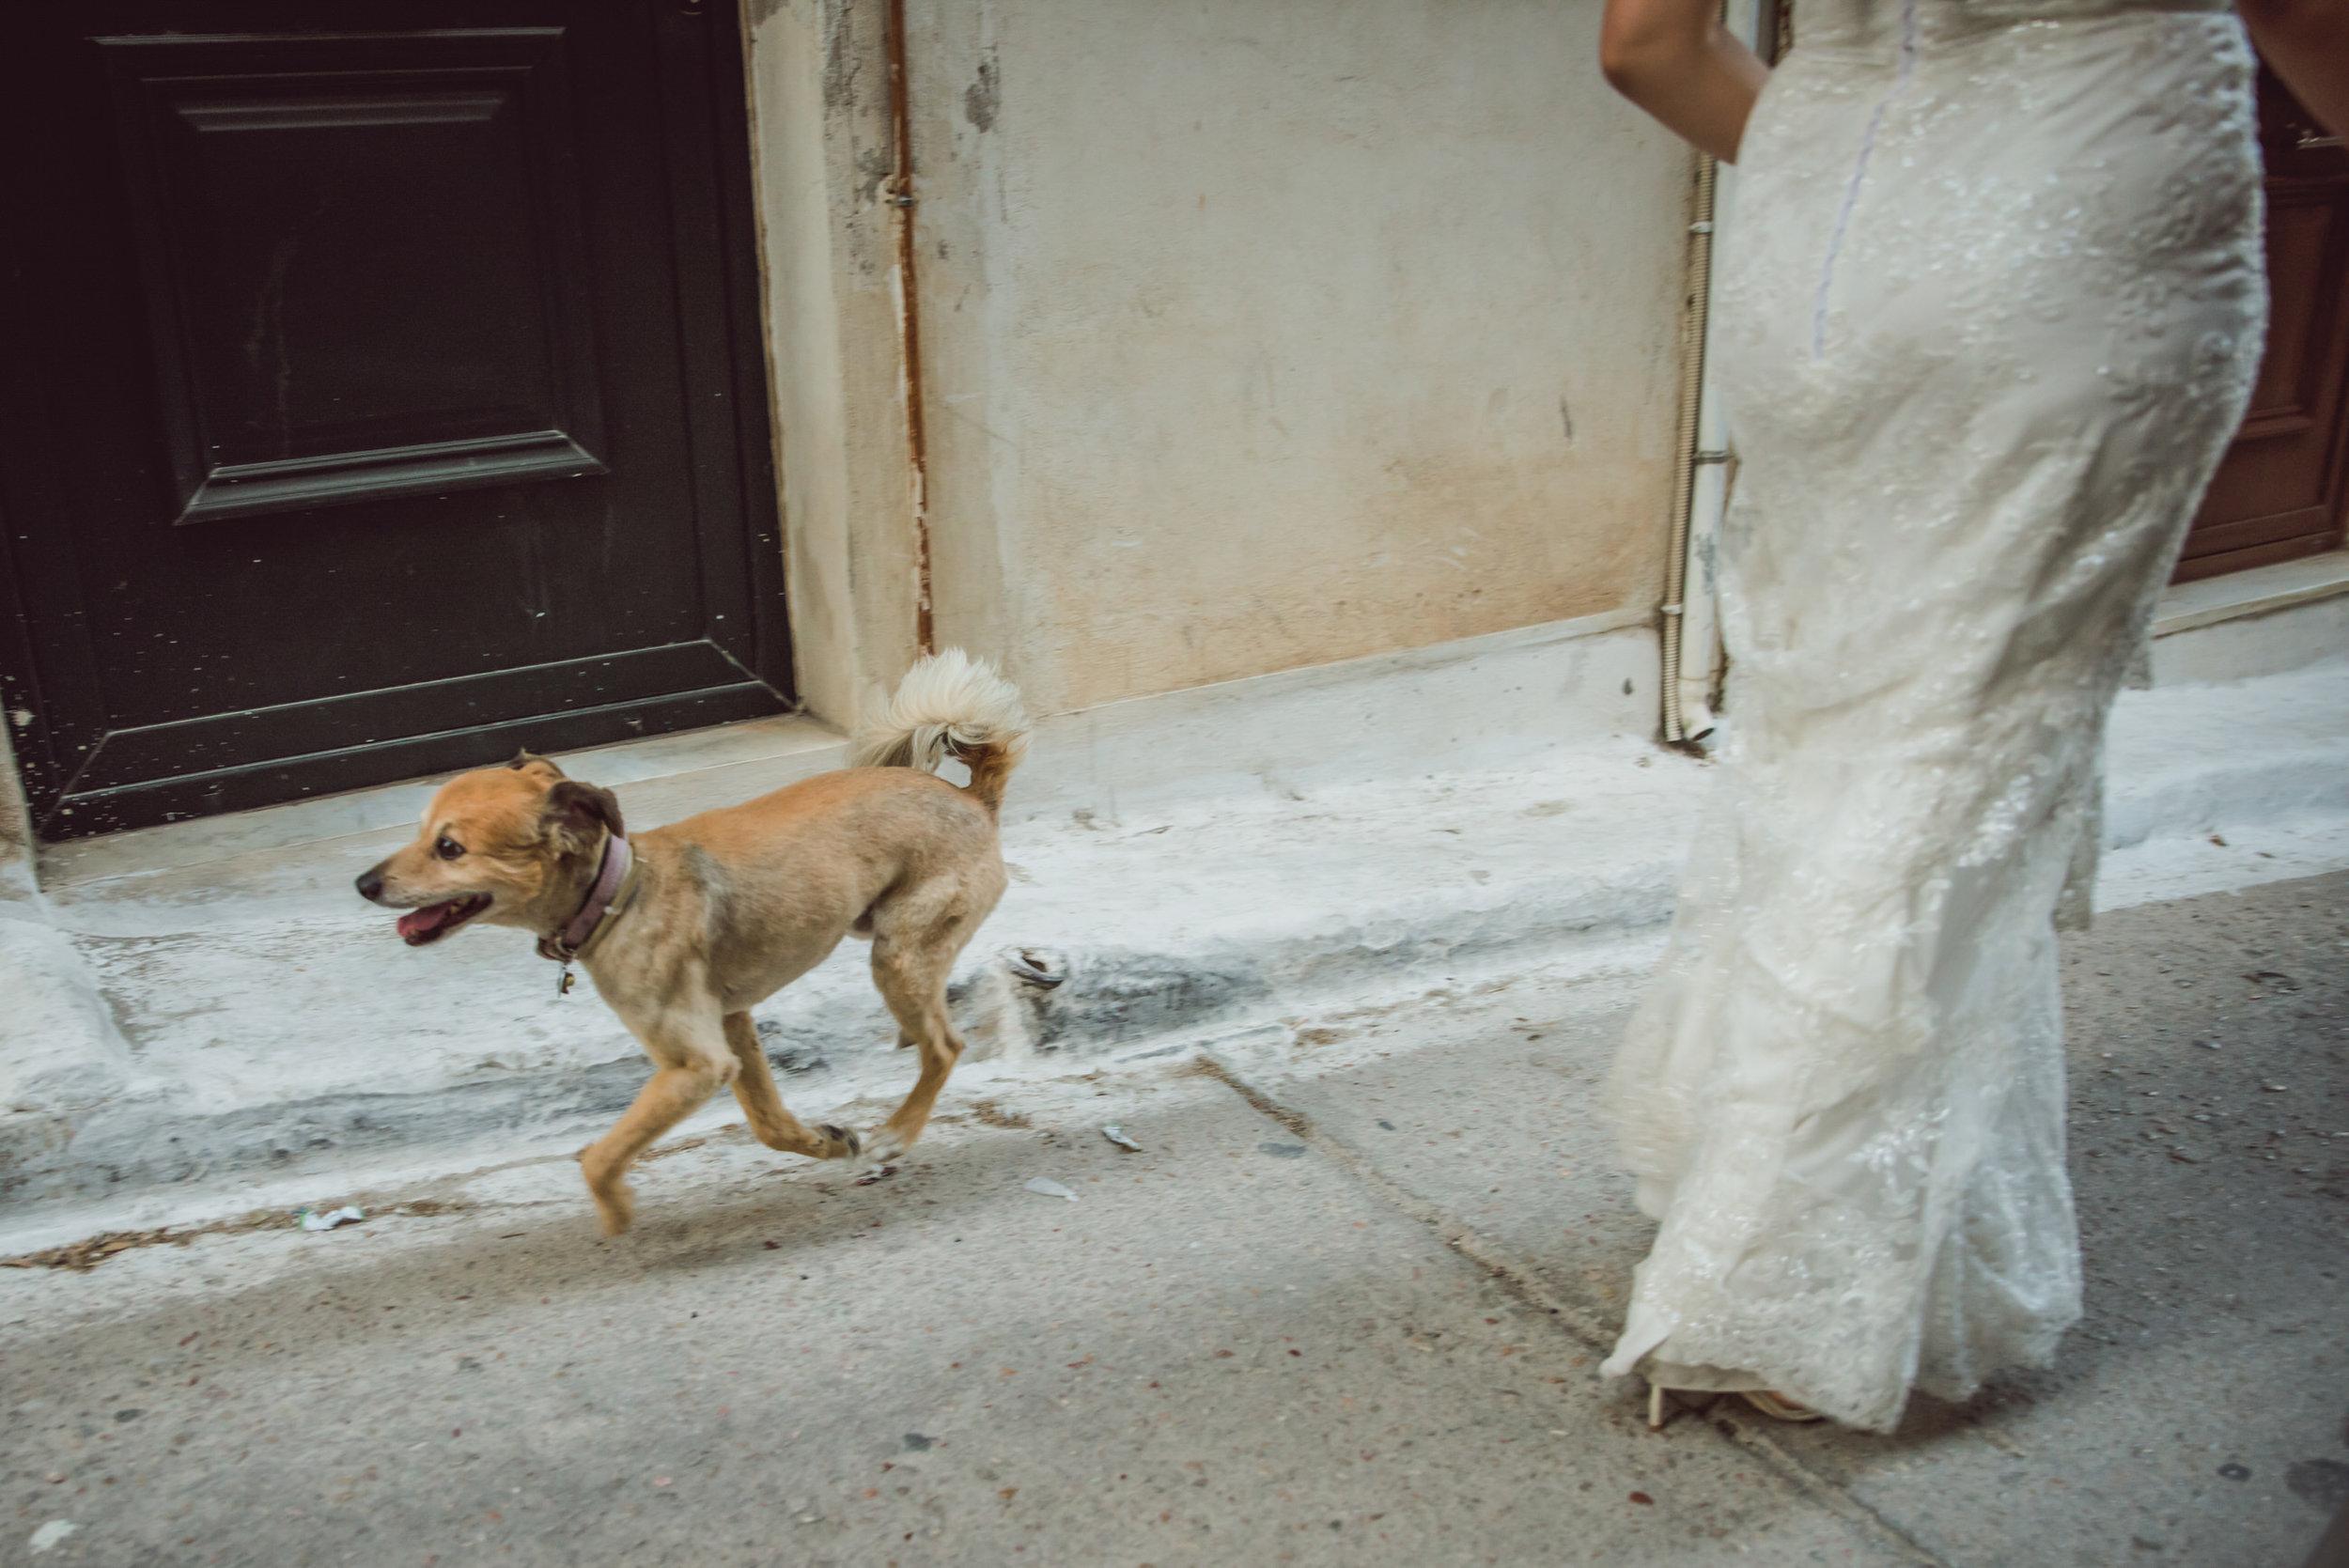 GreeceWedding-Tricia&Will-DayAfter-36.jpg